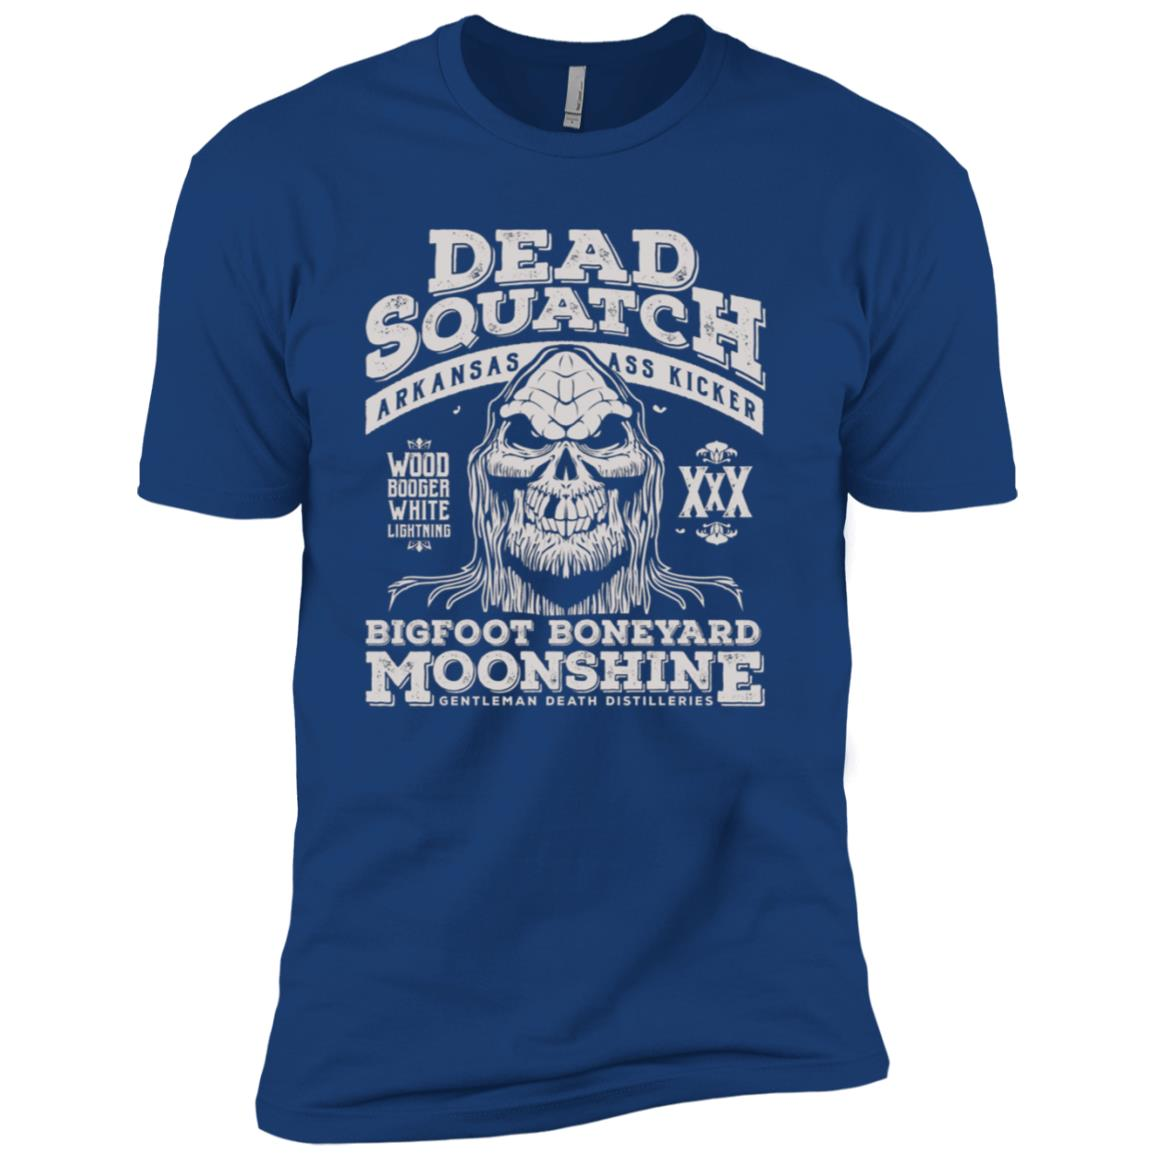 Dead Squatch Bigfoot Boneyard Moonshine Men Short Sleeve T-Shirt